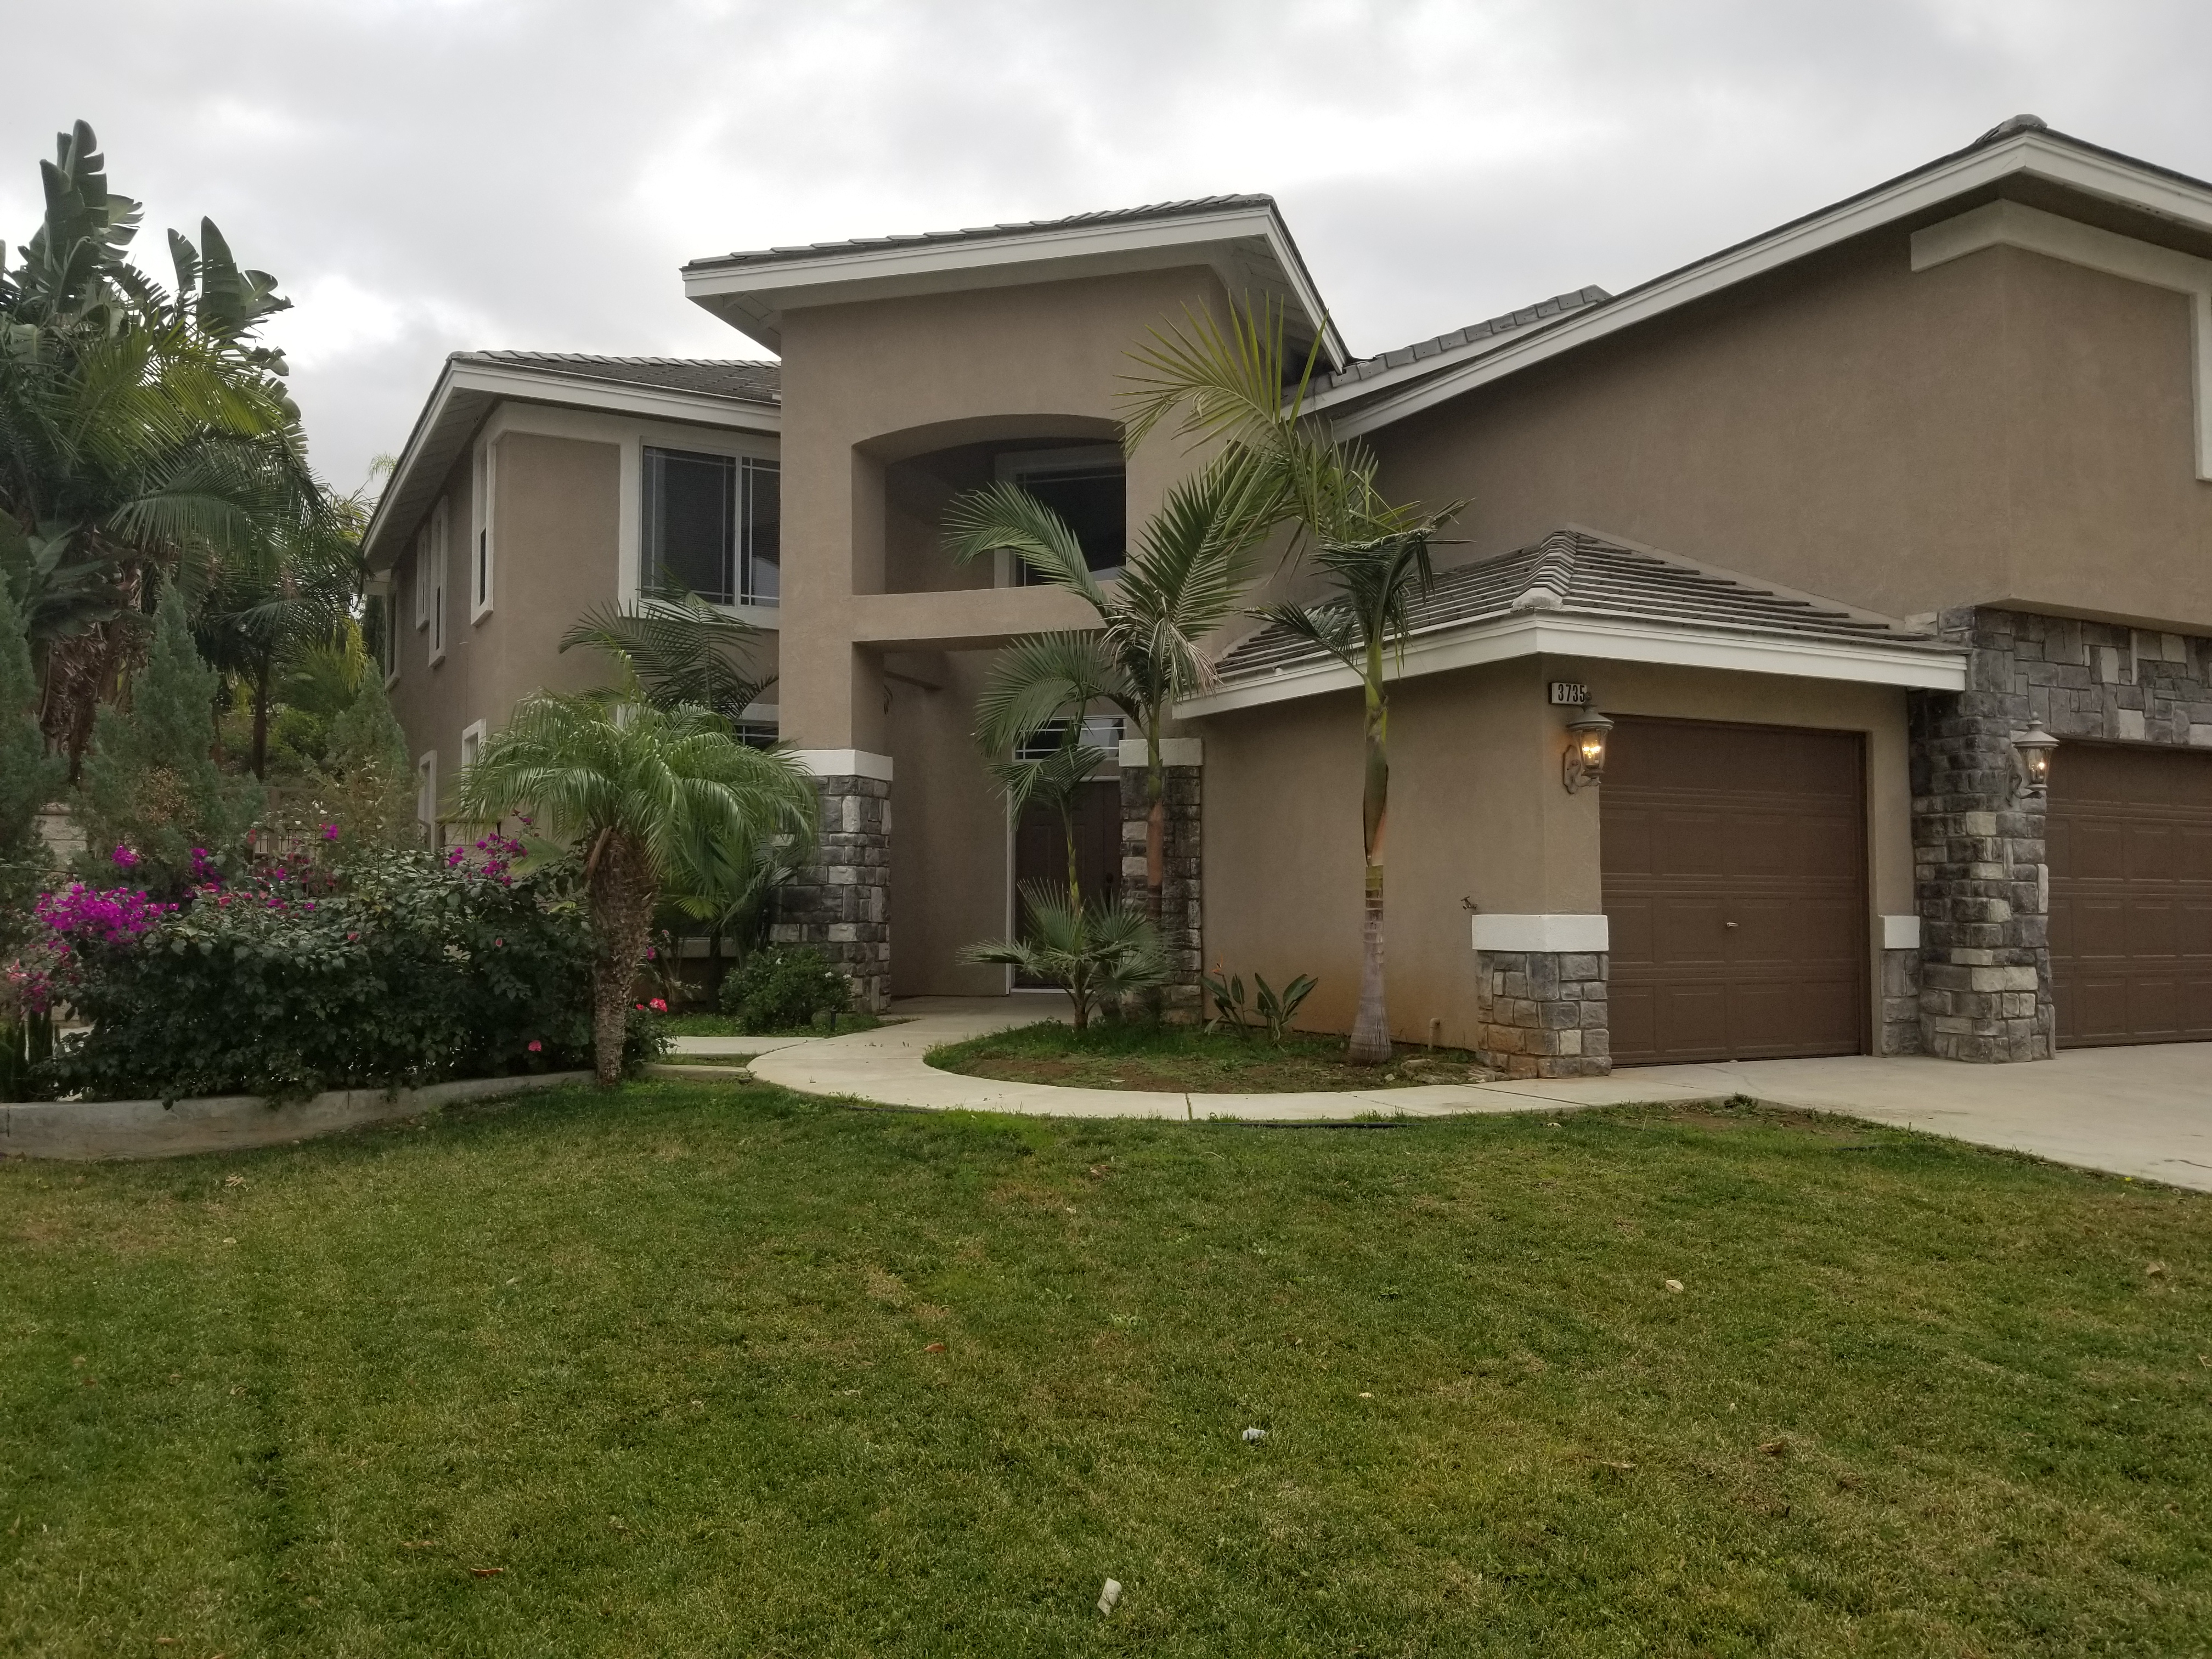 Photo of 3735 Hilgard St, Corona, CA, 92882